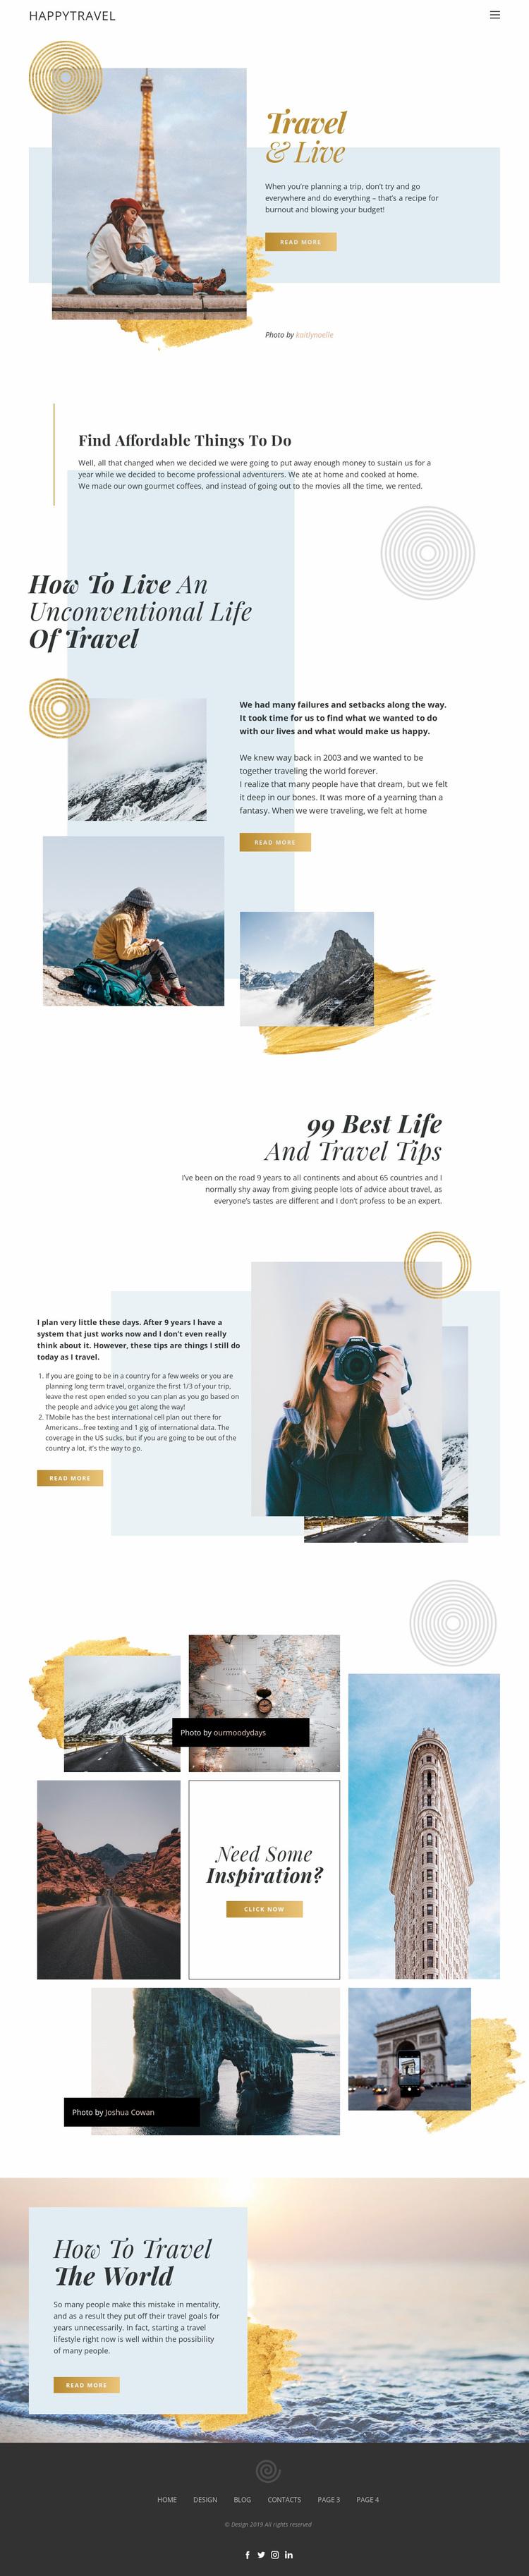 Travel and Live Website Design